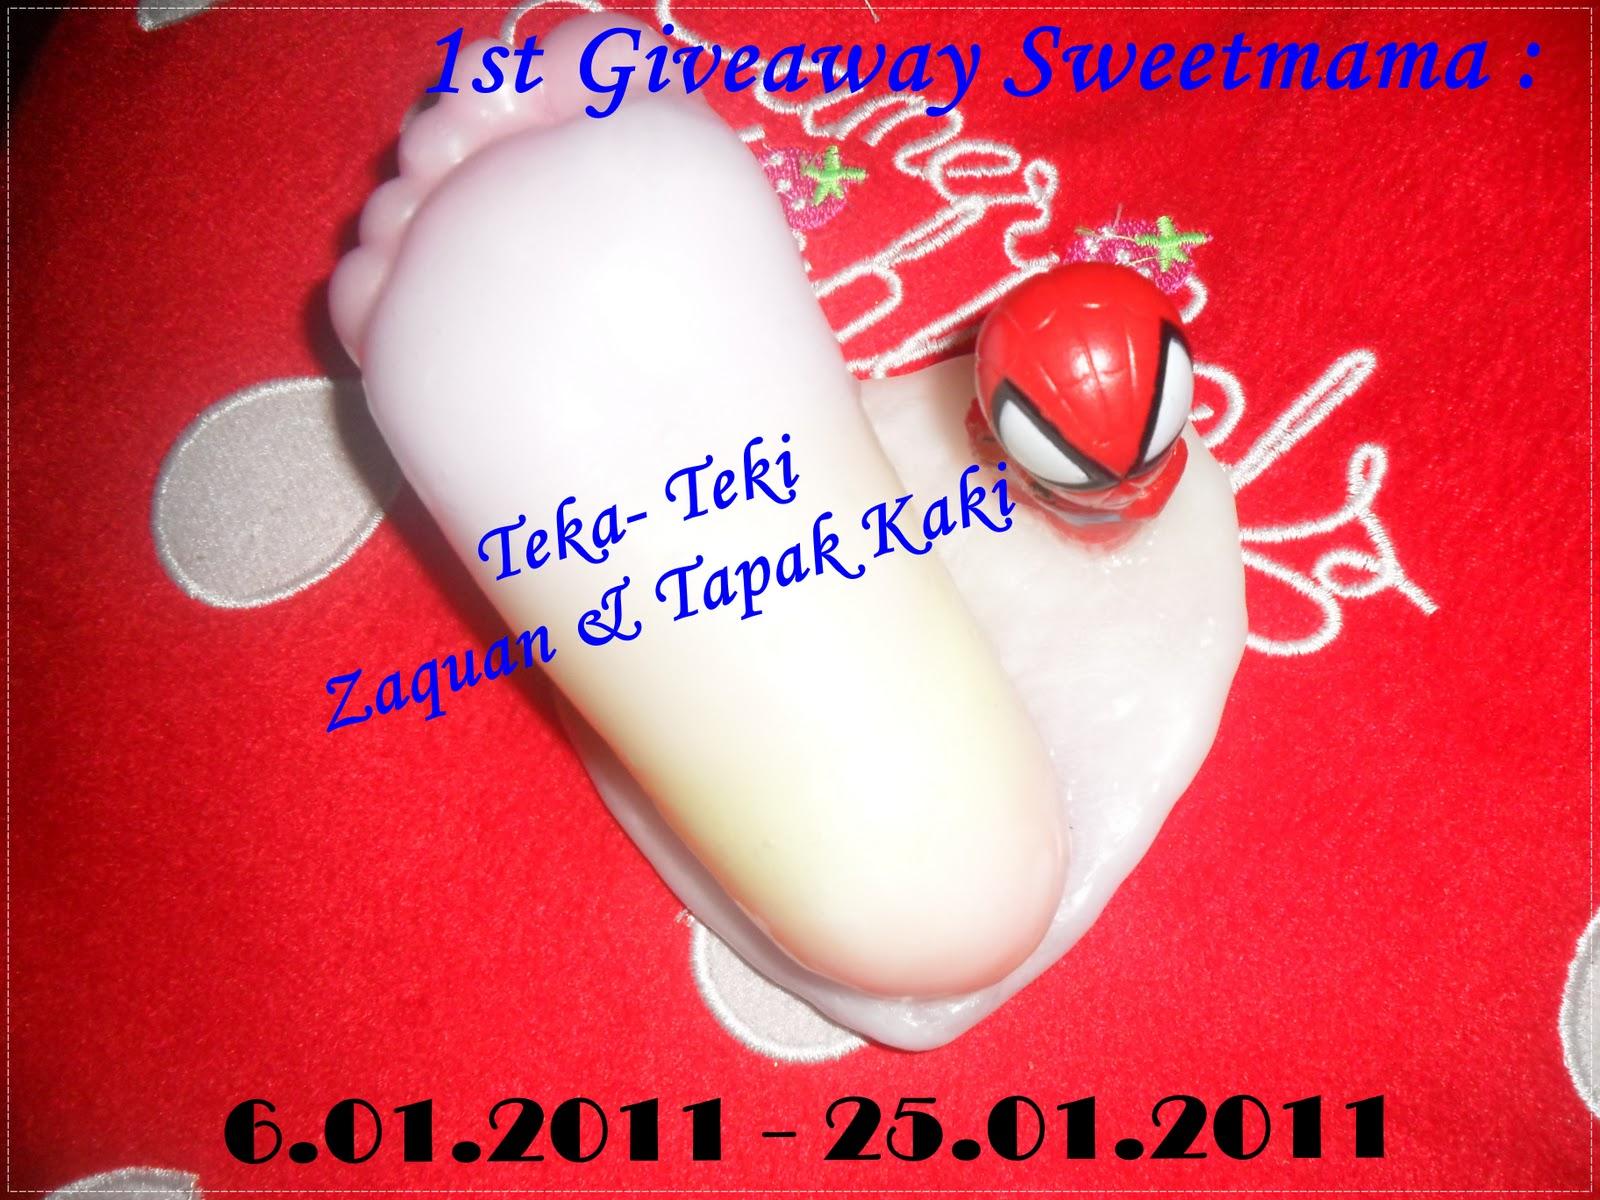 1st Giveaway Sweetmama